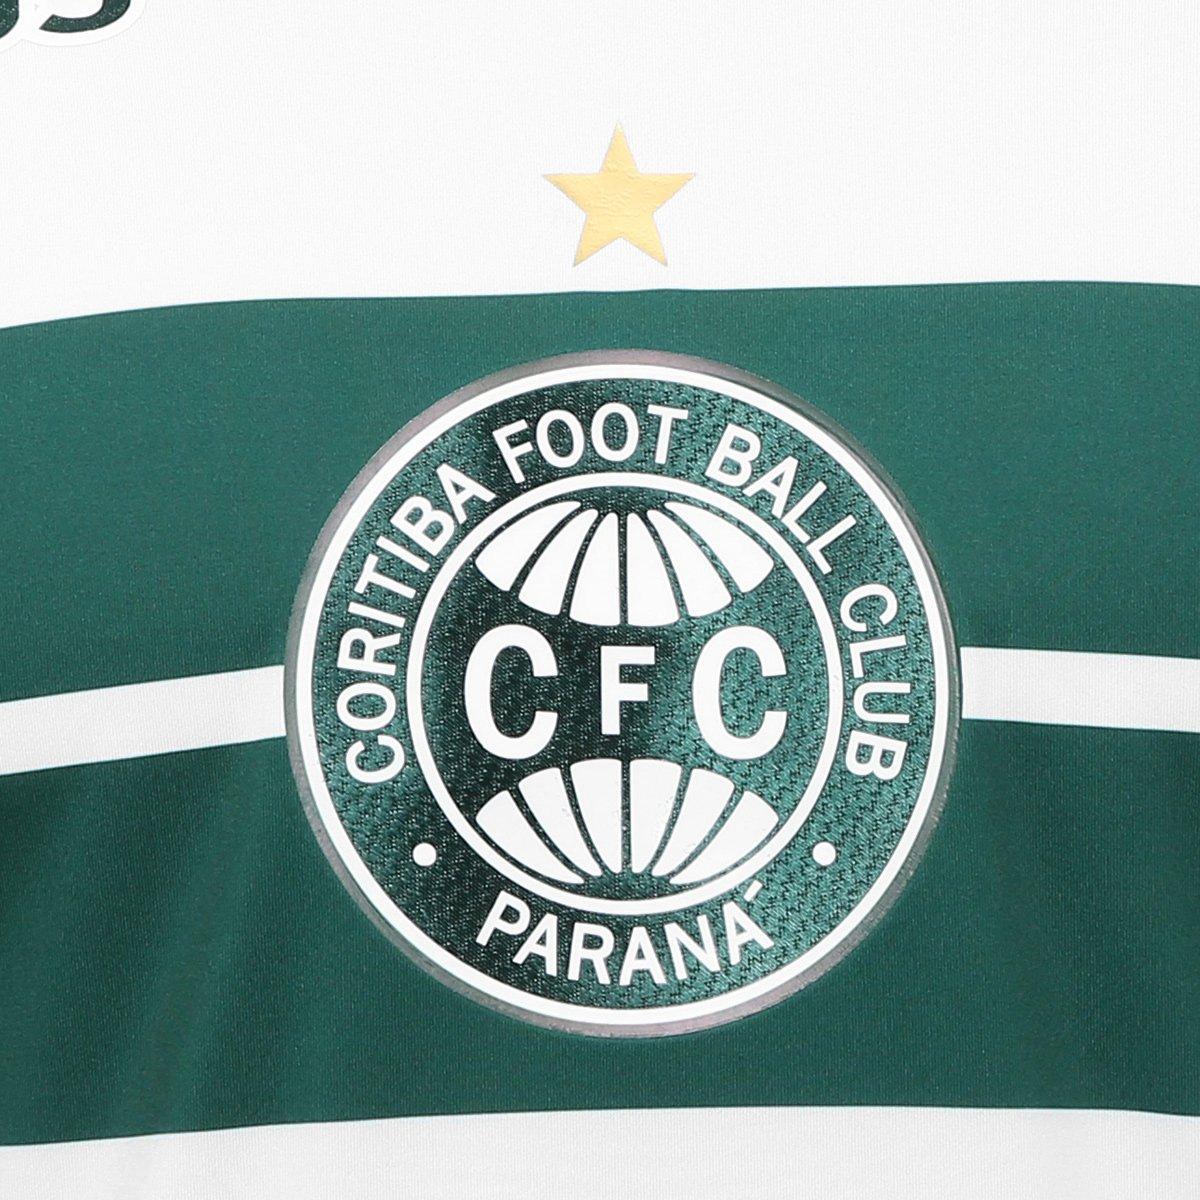 cdadeb1b06 ... Camisa Coritiba I 2018 s n° C Patrocínio - Jogador 1909 Masculina ...